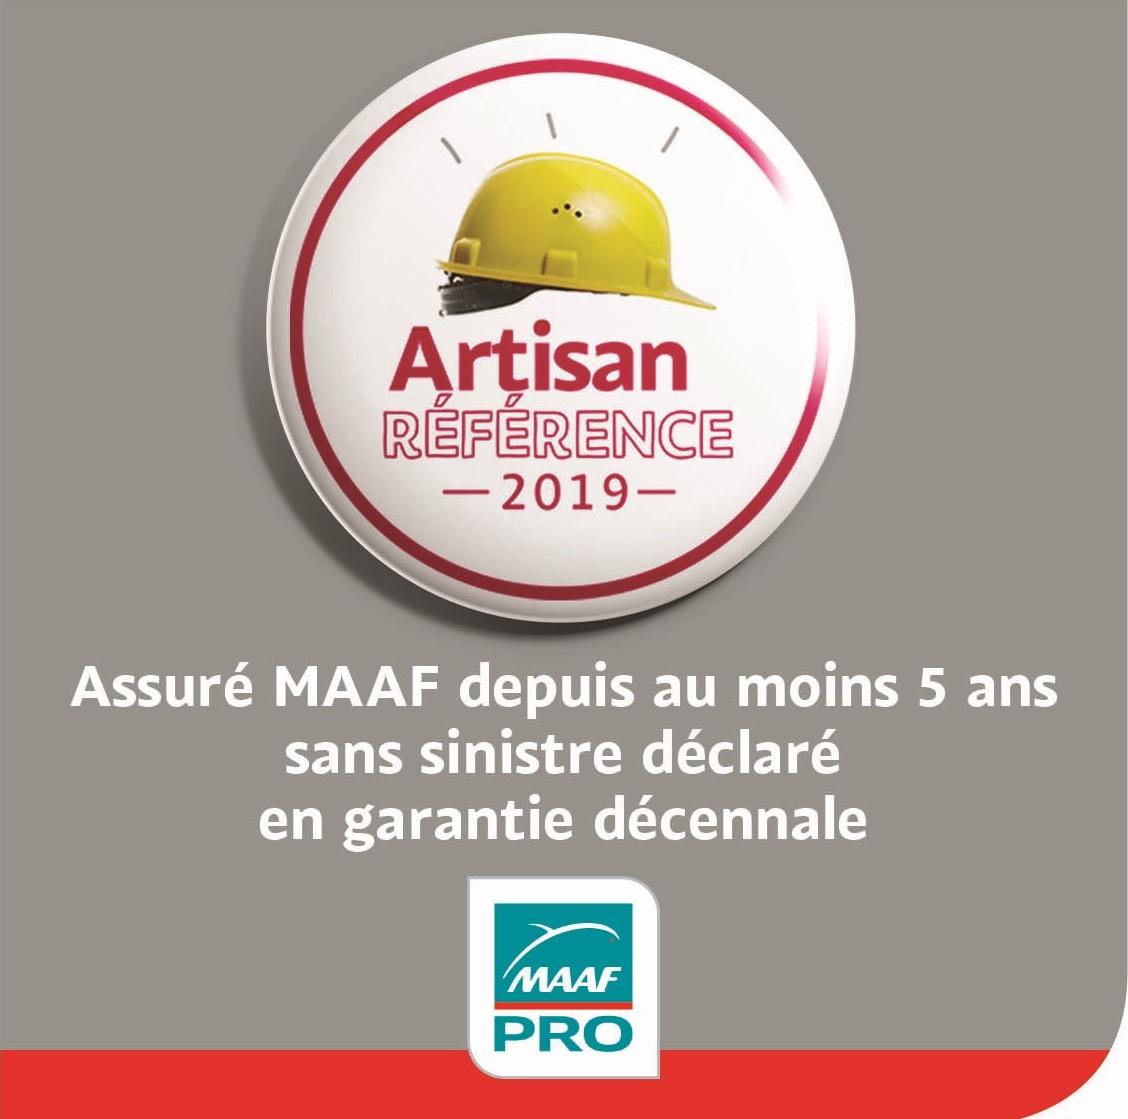 MAAF_Artisan référence 2019